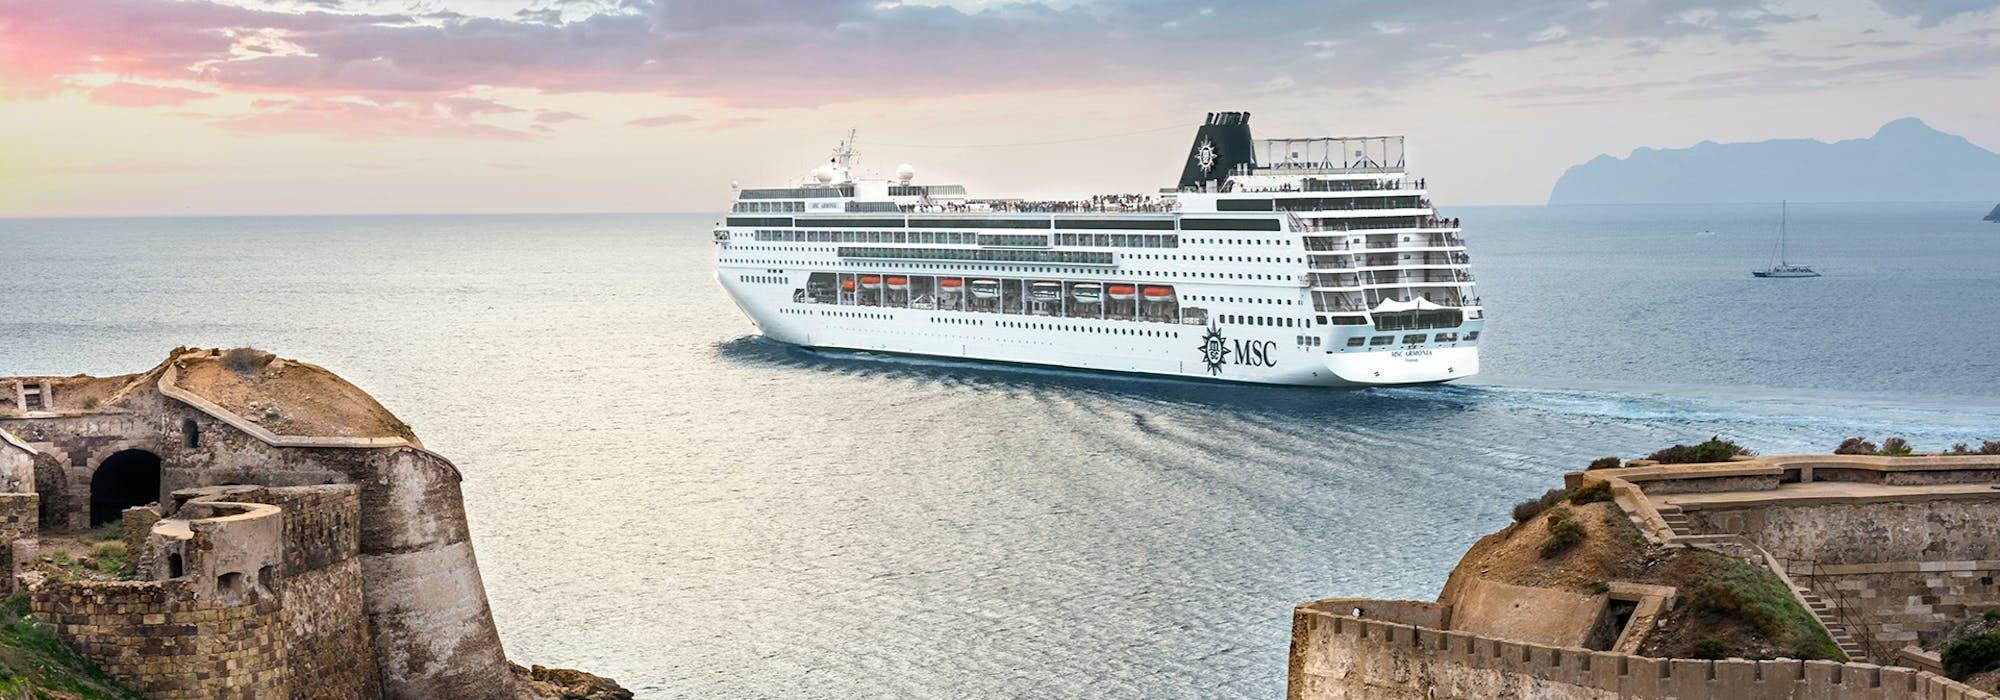 Fartyget MSC Armonia utanför en kust i Medelhavet.